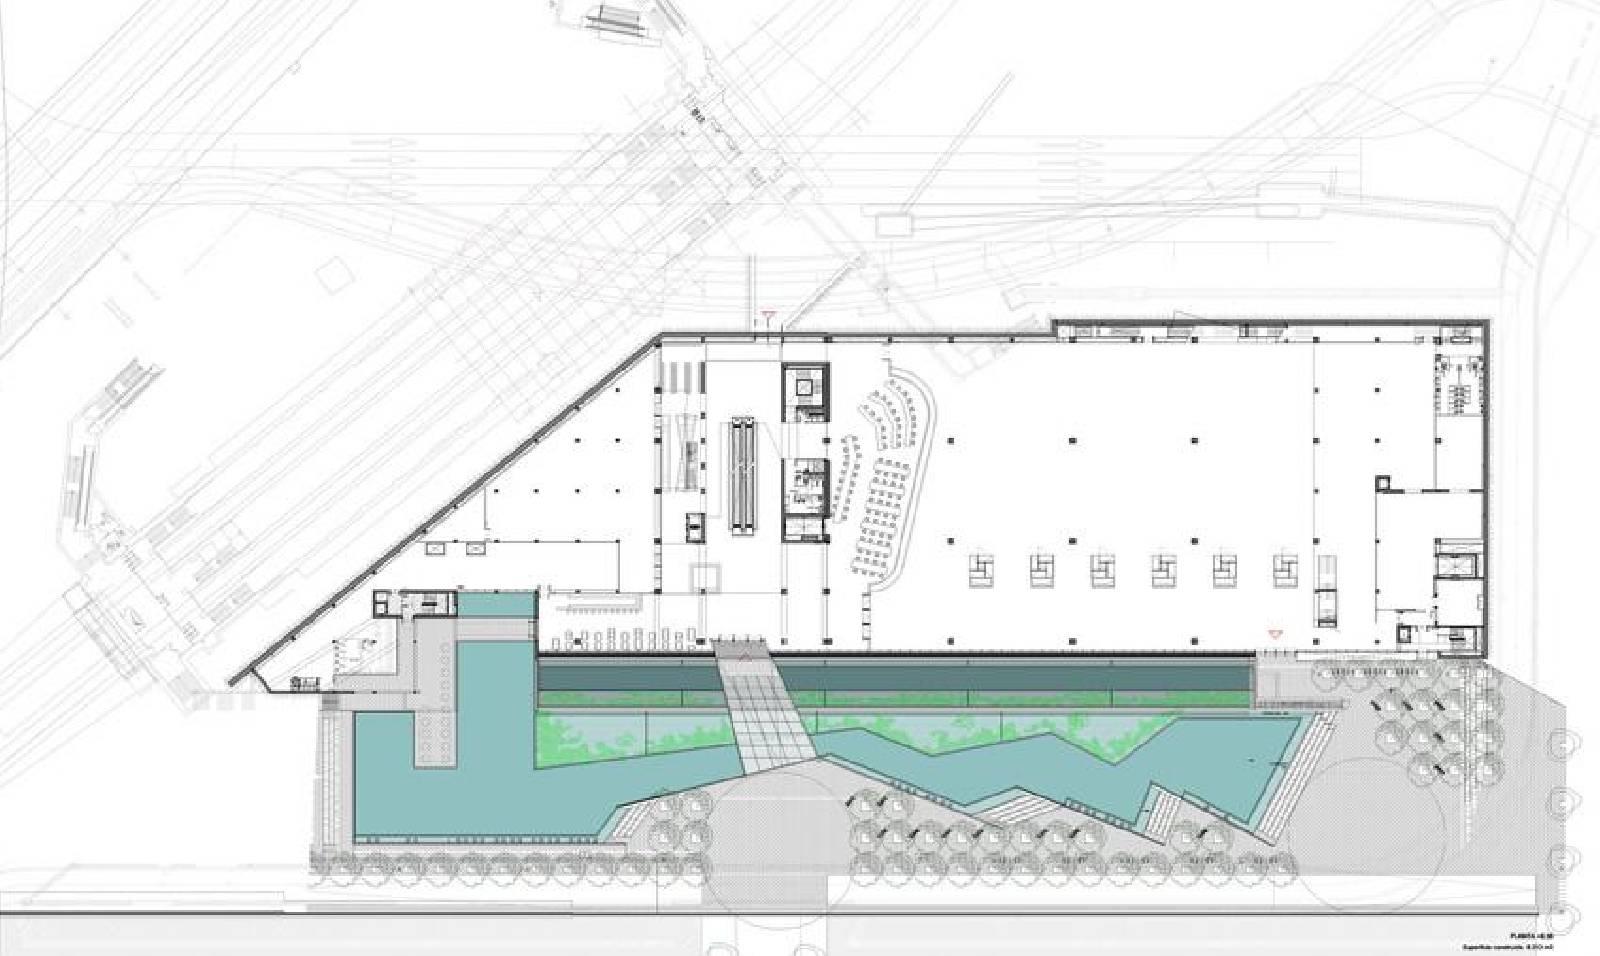 100 Barcelona Pavilion Floor Plan Dimensions  : DHUBdesignmuseumbarcelonabyMBMarquitectes17 from verdantstudios.com size 1600 x 956 jpeg 135kB